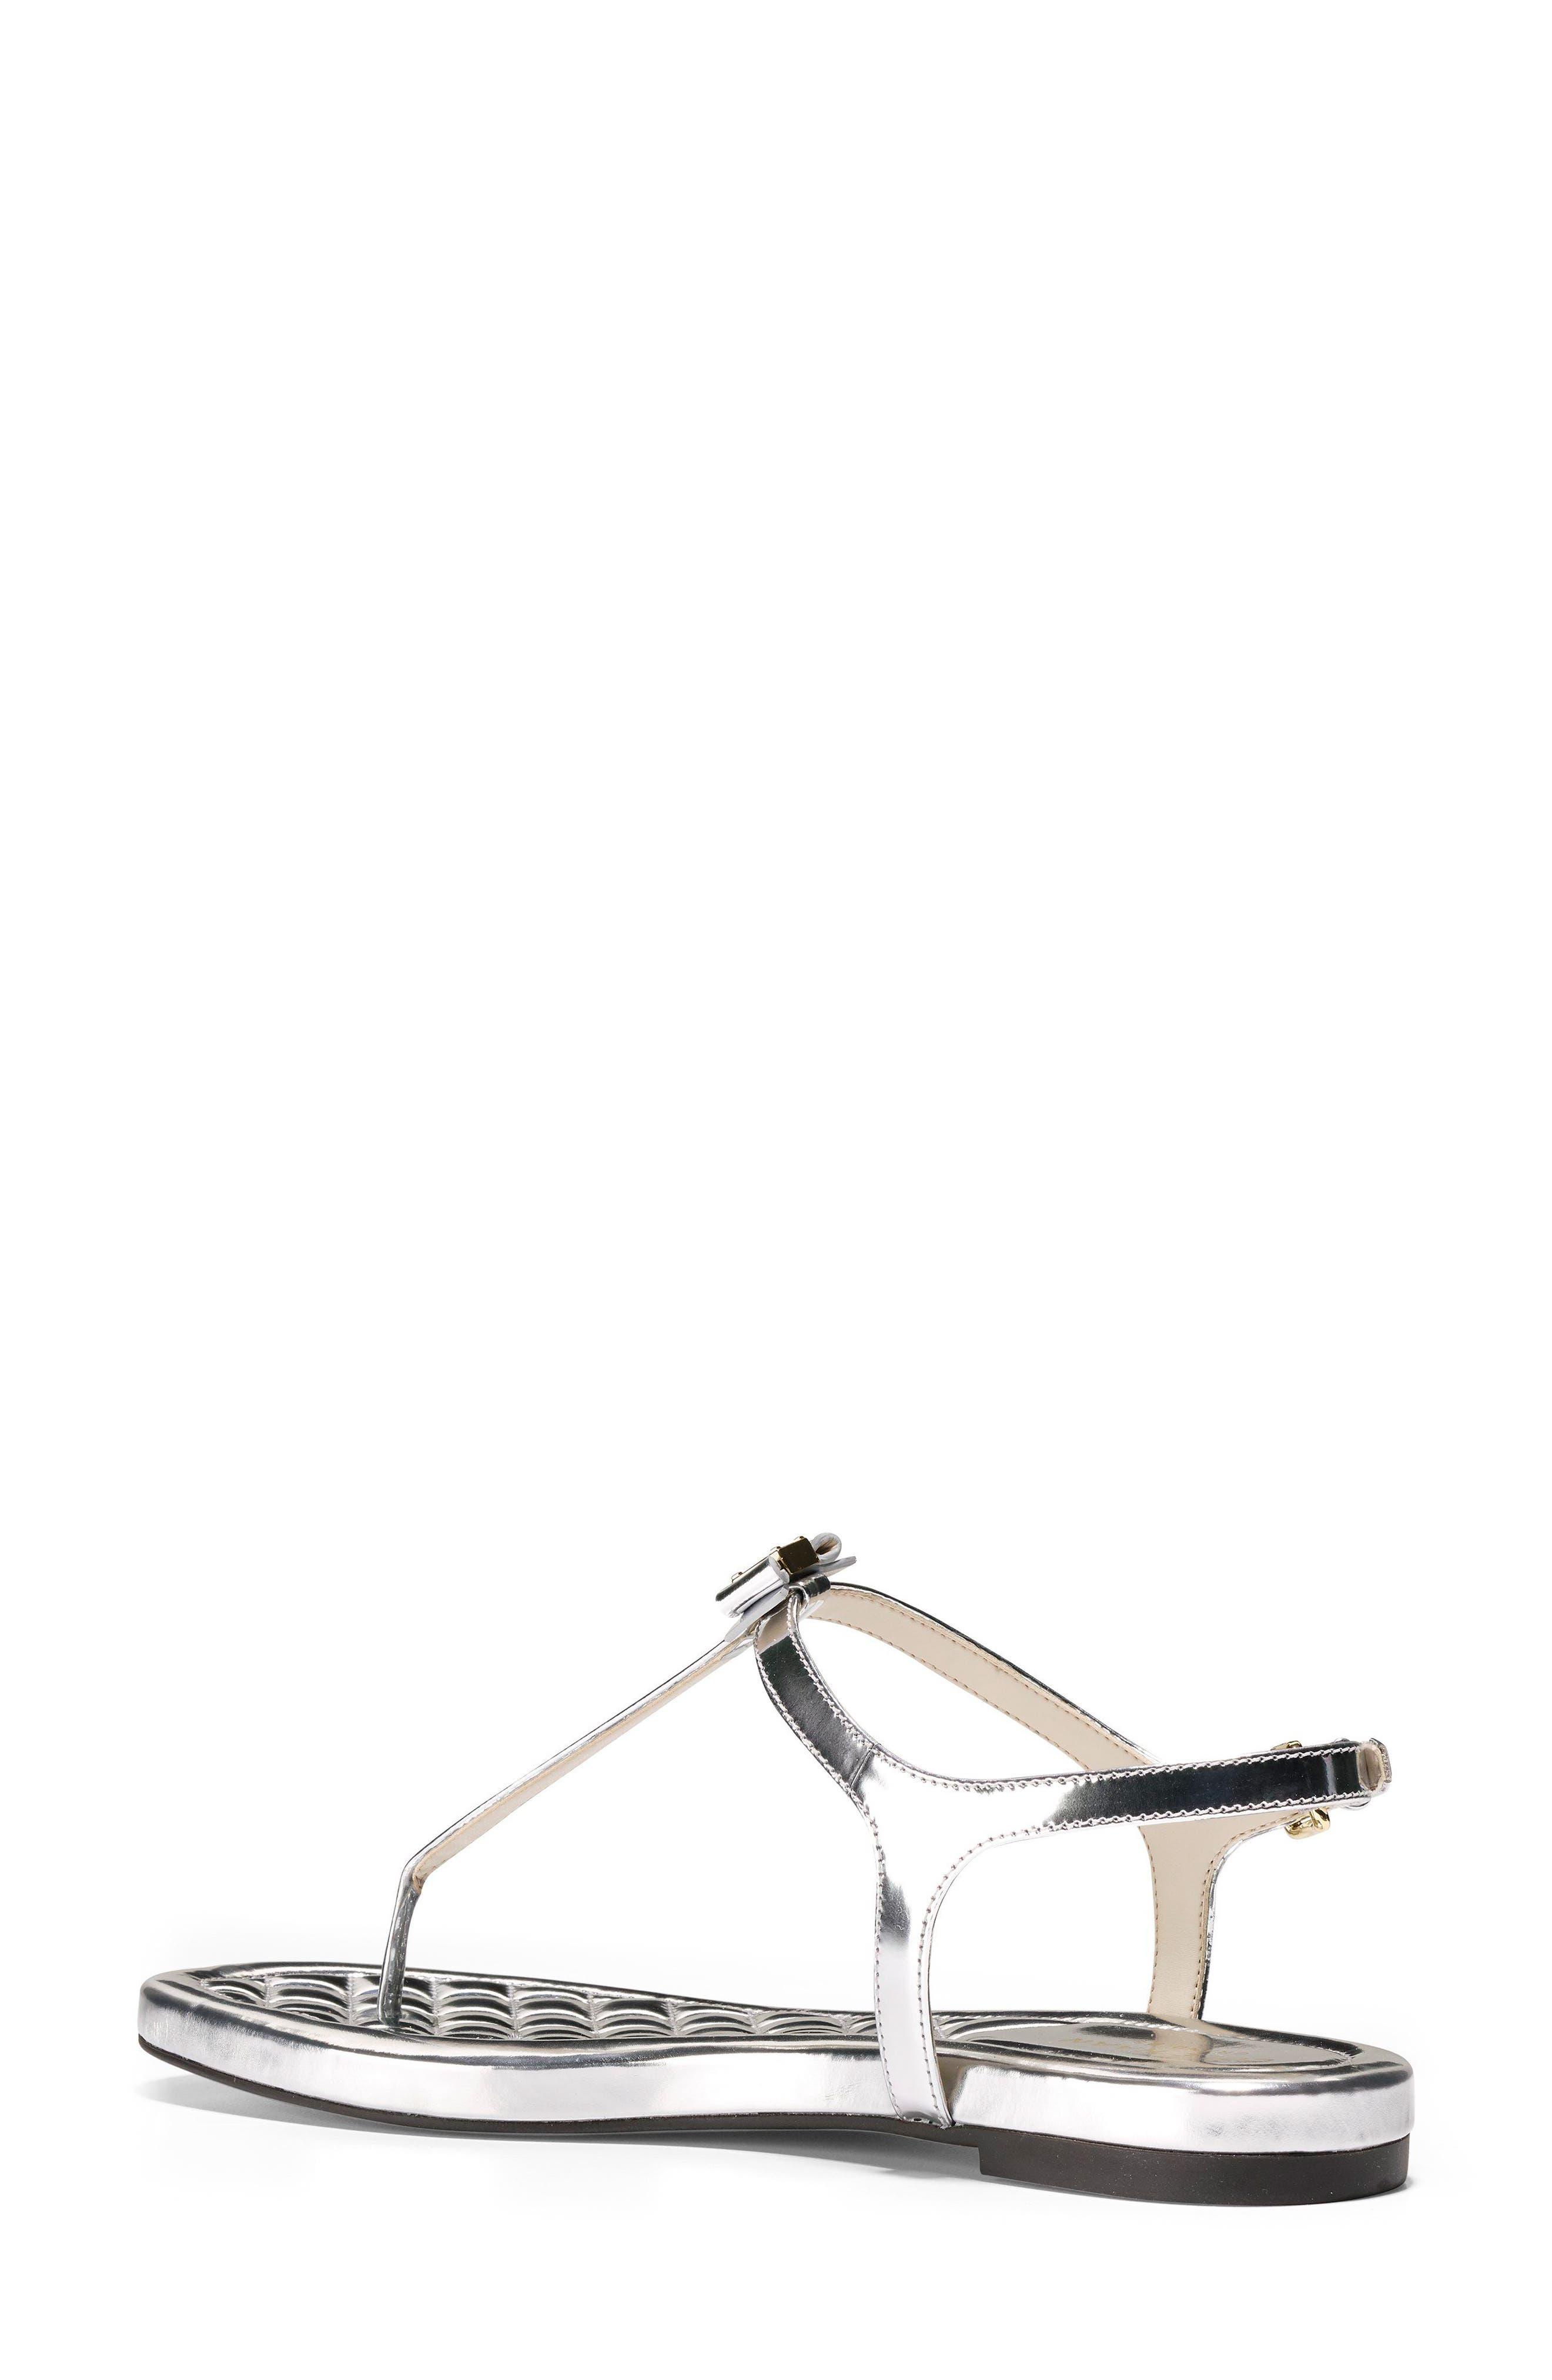 Tali Bow Sandal,                             Alternate thumbnail 2, color,                             Silver Leather